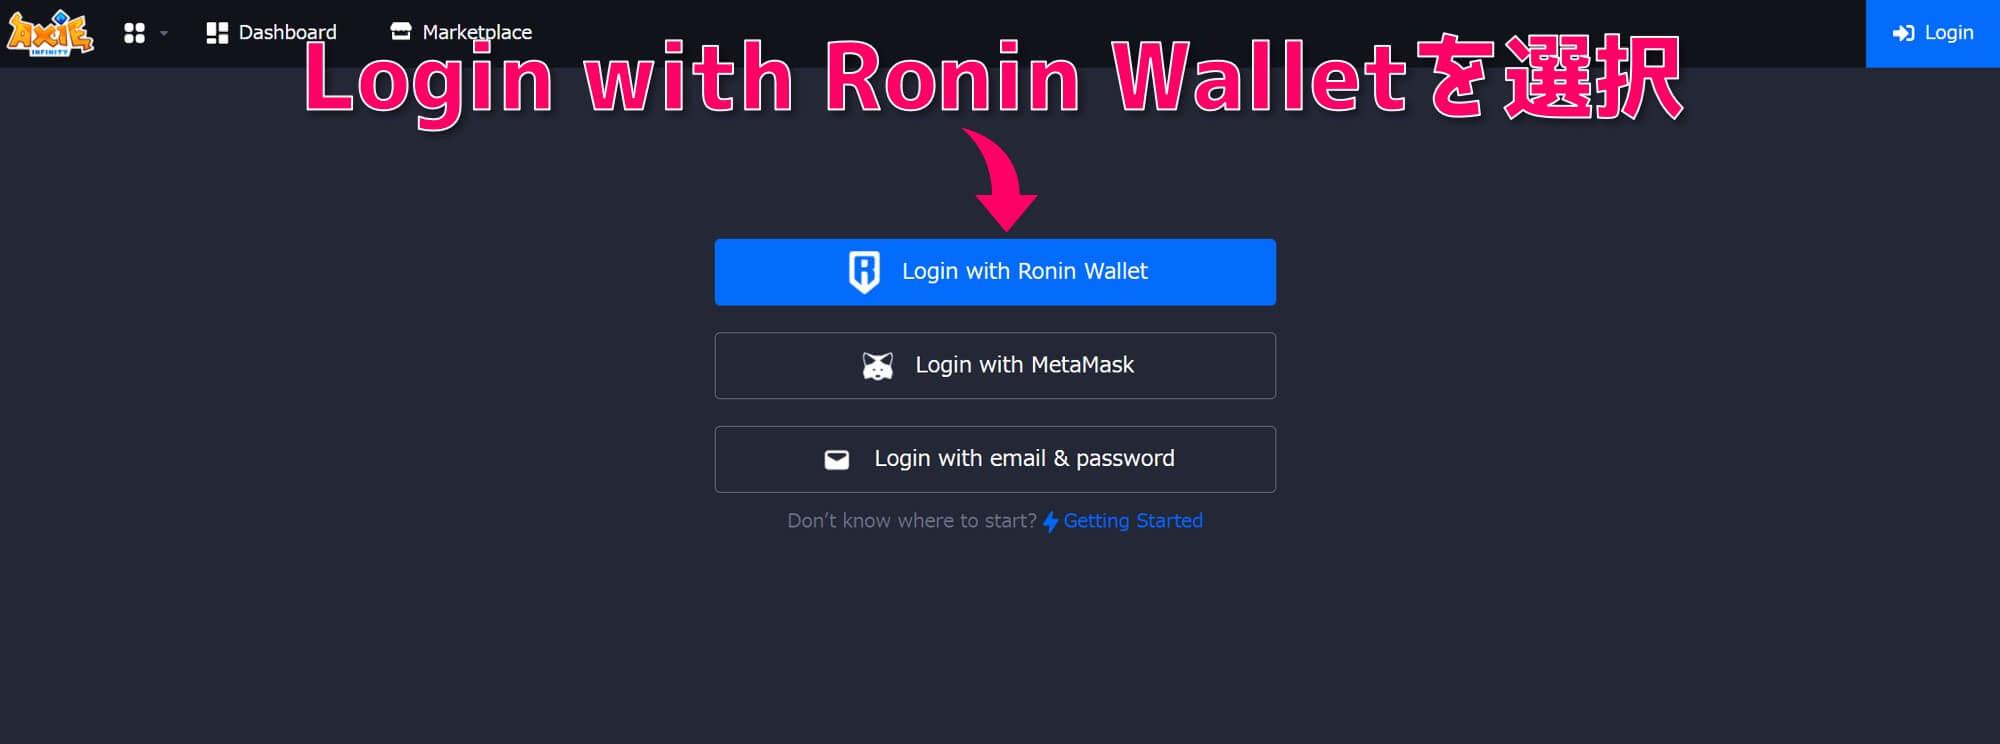 Ronin Walletでログイン